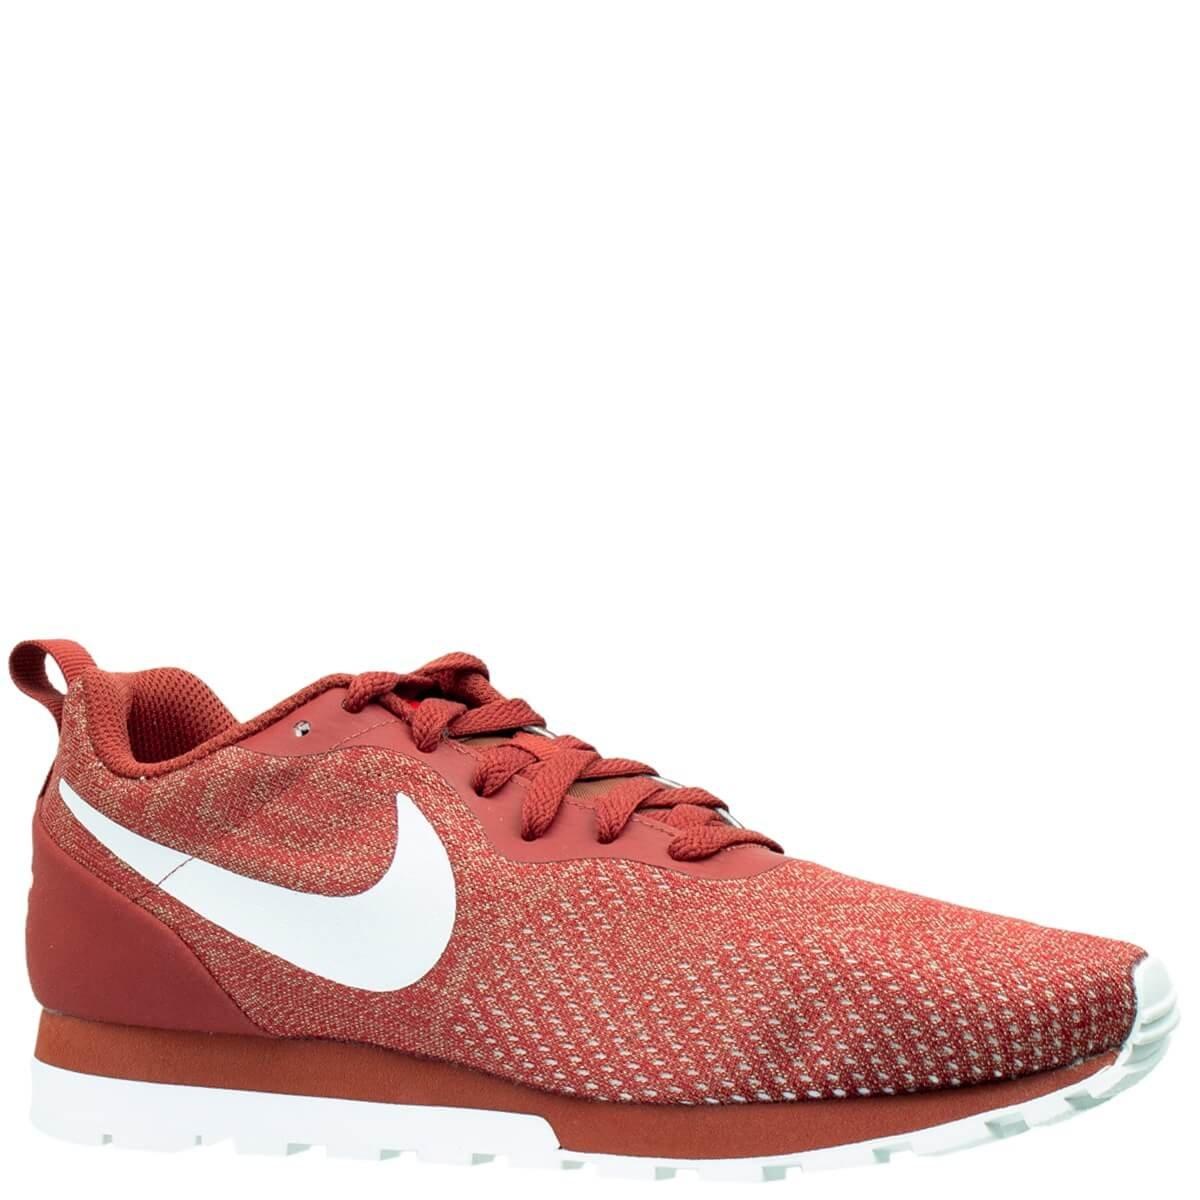 314930f3d Bizz Store - Tênis Masculino Nike MD Runner 2 Eng Mesh